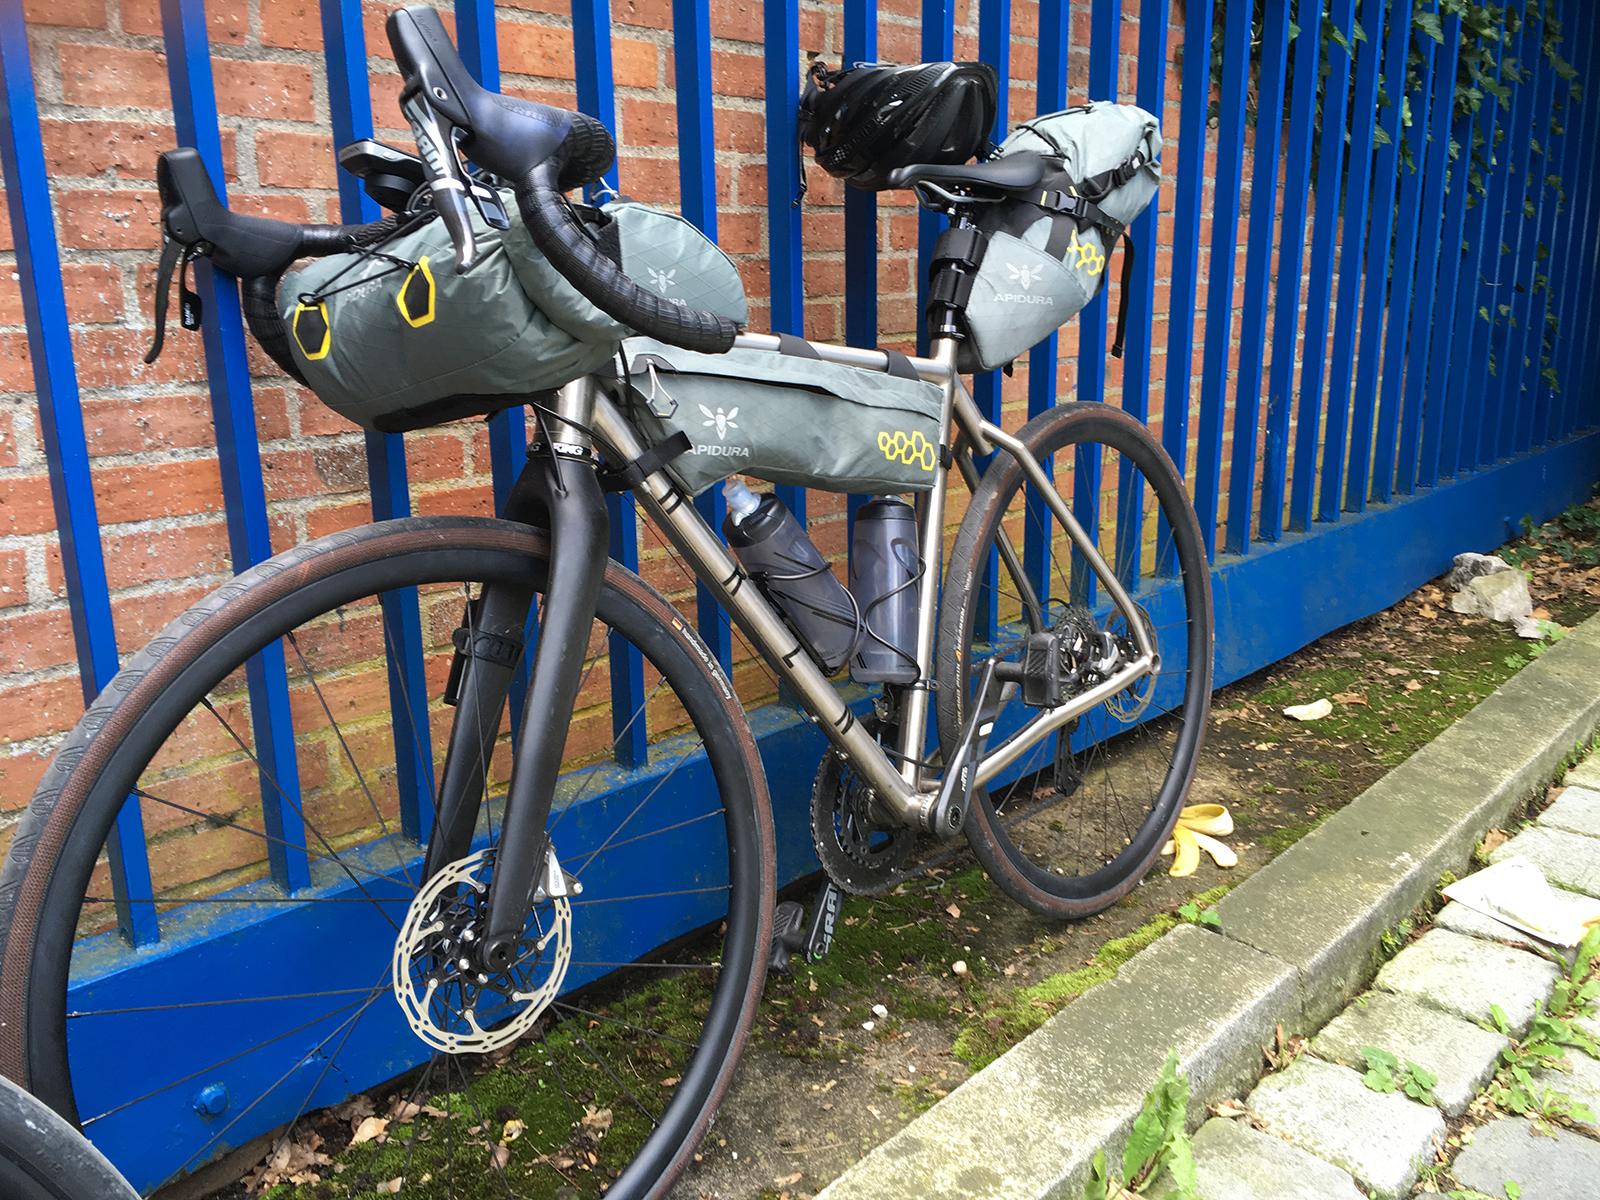 GRANDE_NORD_NC4K_bikepacking006